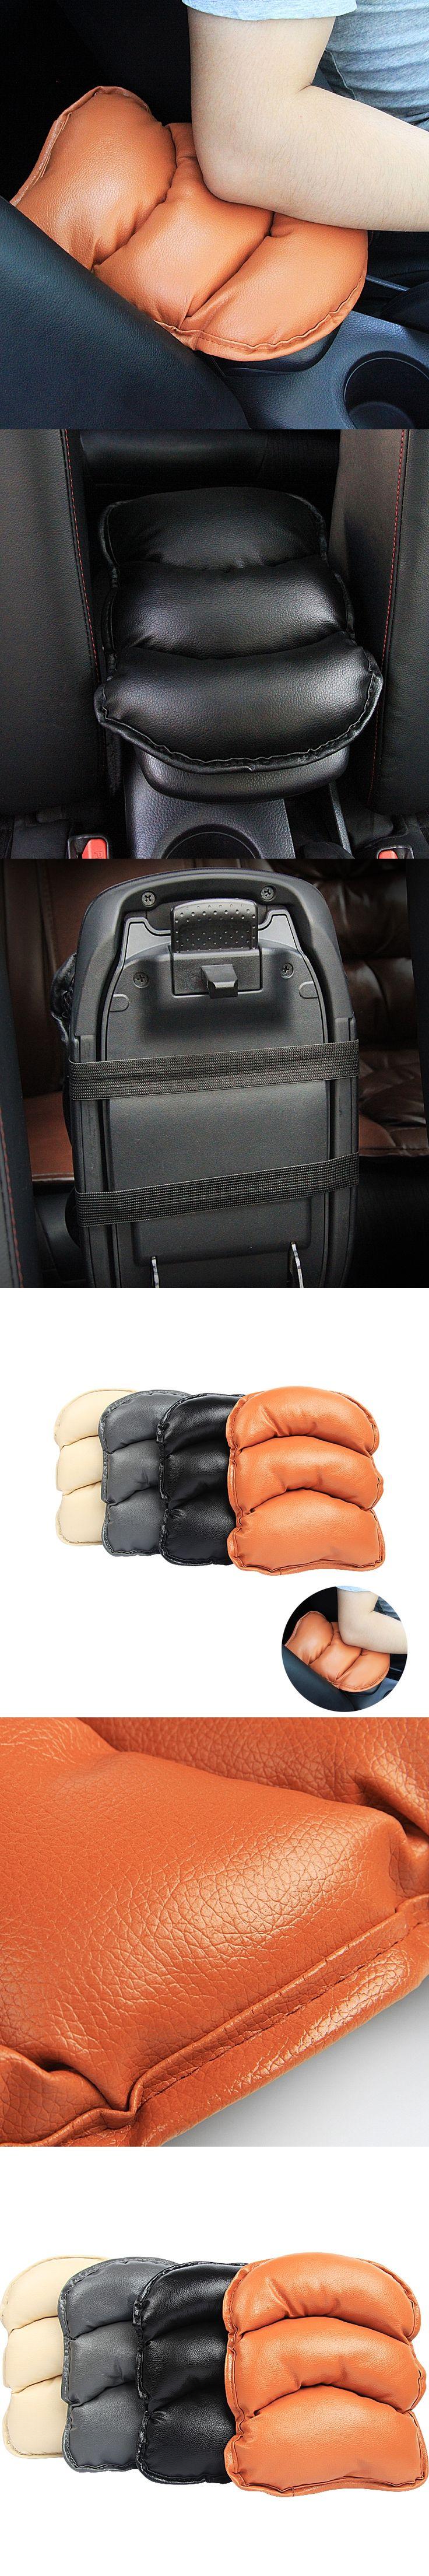 Car Auto Center Console Armrest Pad Cover Cushion For Skoda Octavia A5 A7 Fabia Rapid Yeti Superb Mazda 2 3 5 6 CX-3 CX-5 CX-7